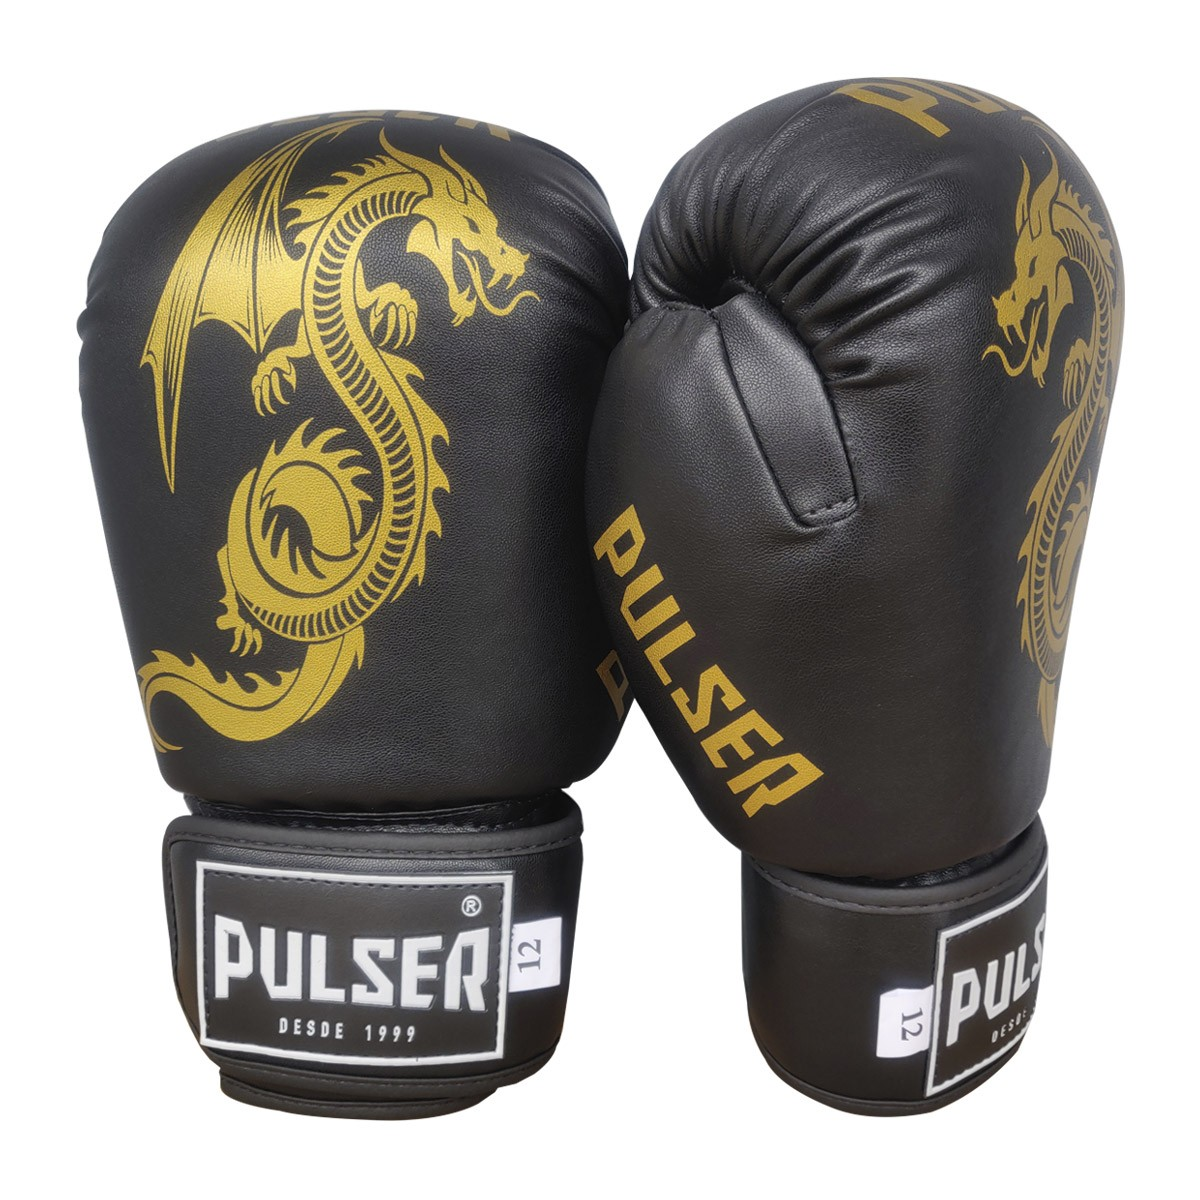 Luva de Boxe / Muay Thai 12oz PU - Pulser  - PRALUTA SHOP